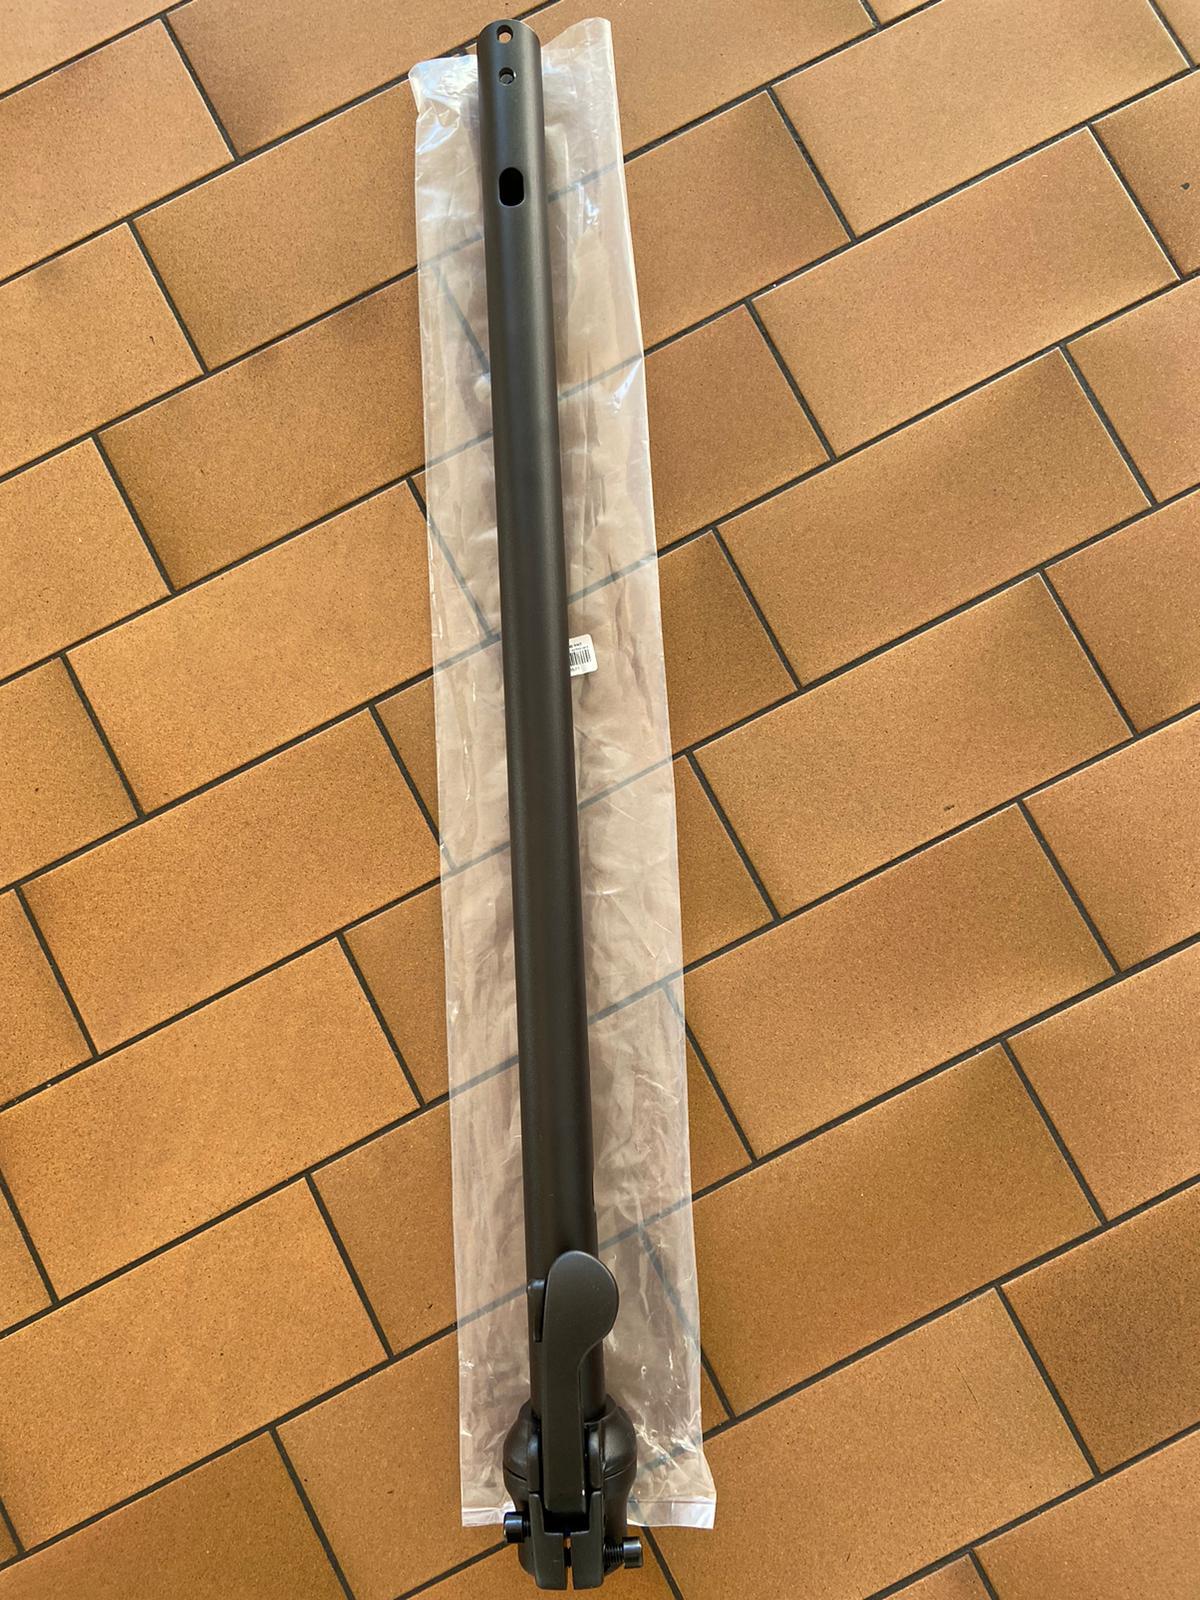 Lenkgabel (vertikal) incl. Klappmechanismus schwarz